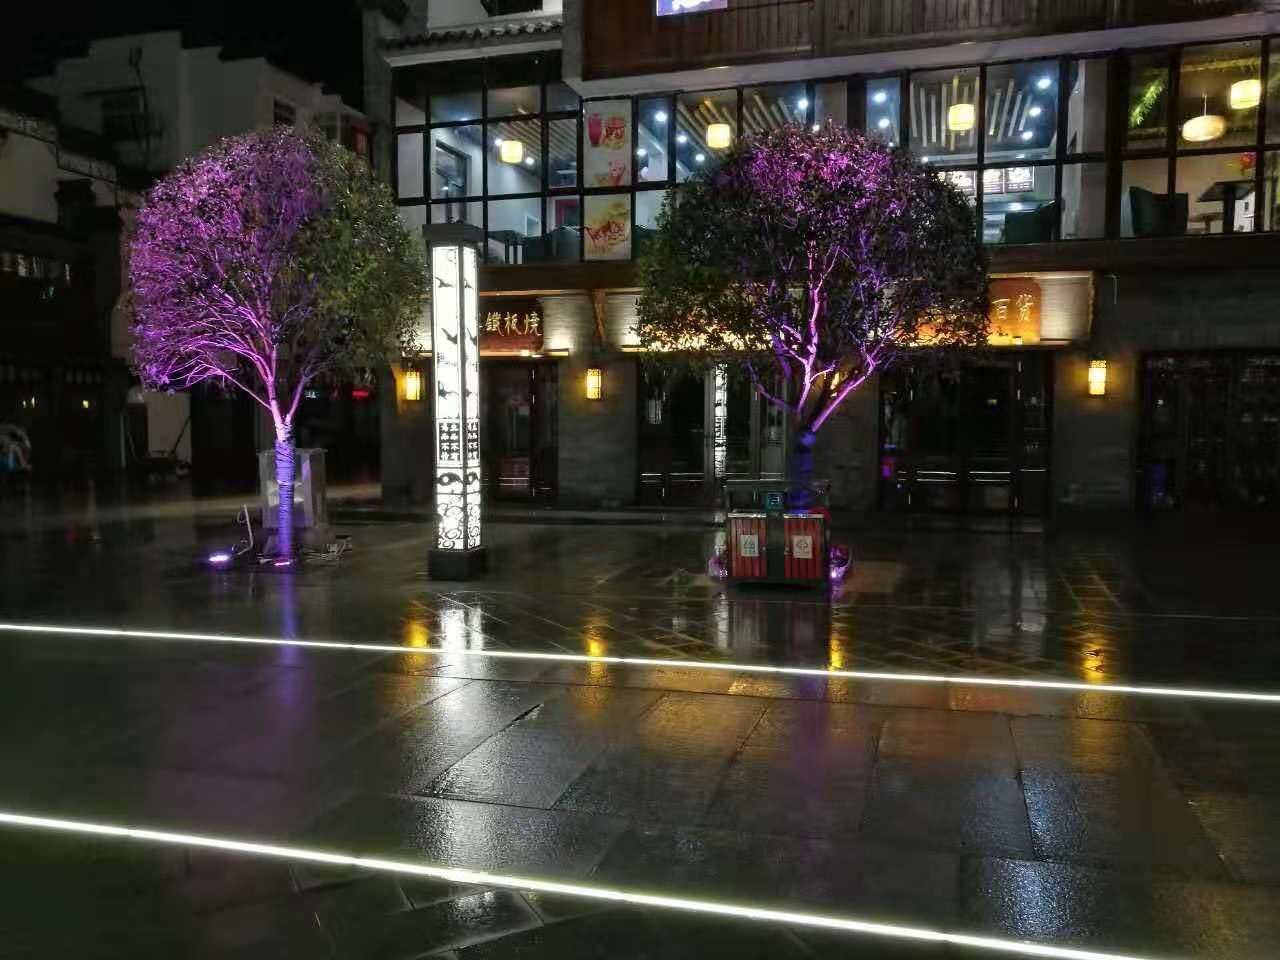 发光砖弧线LED埋地灯